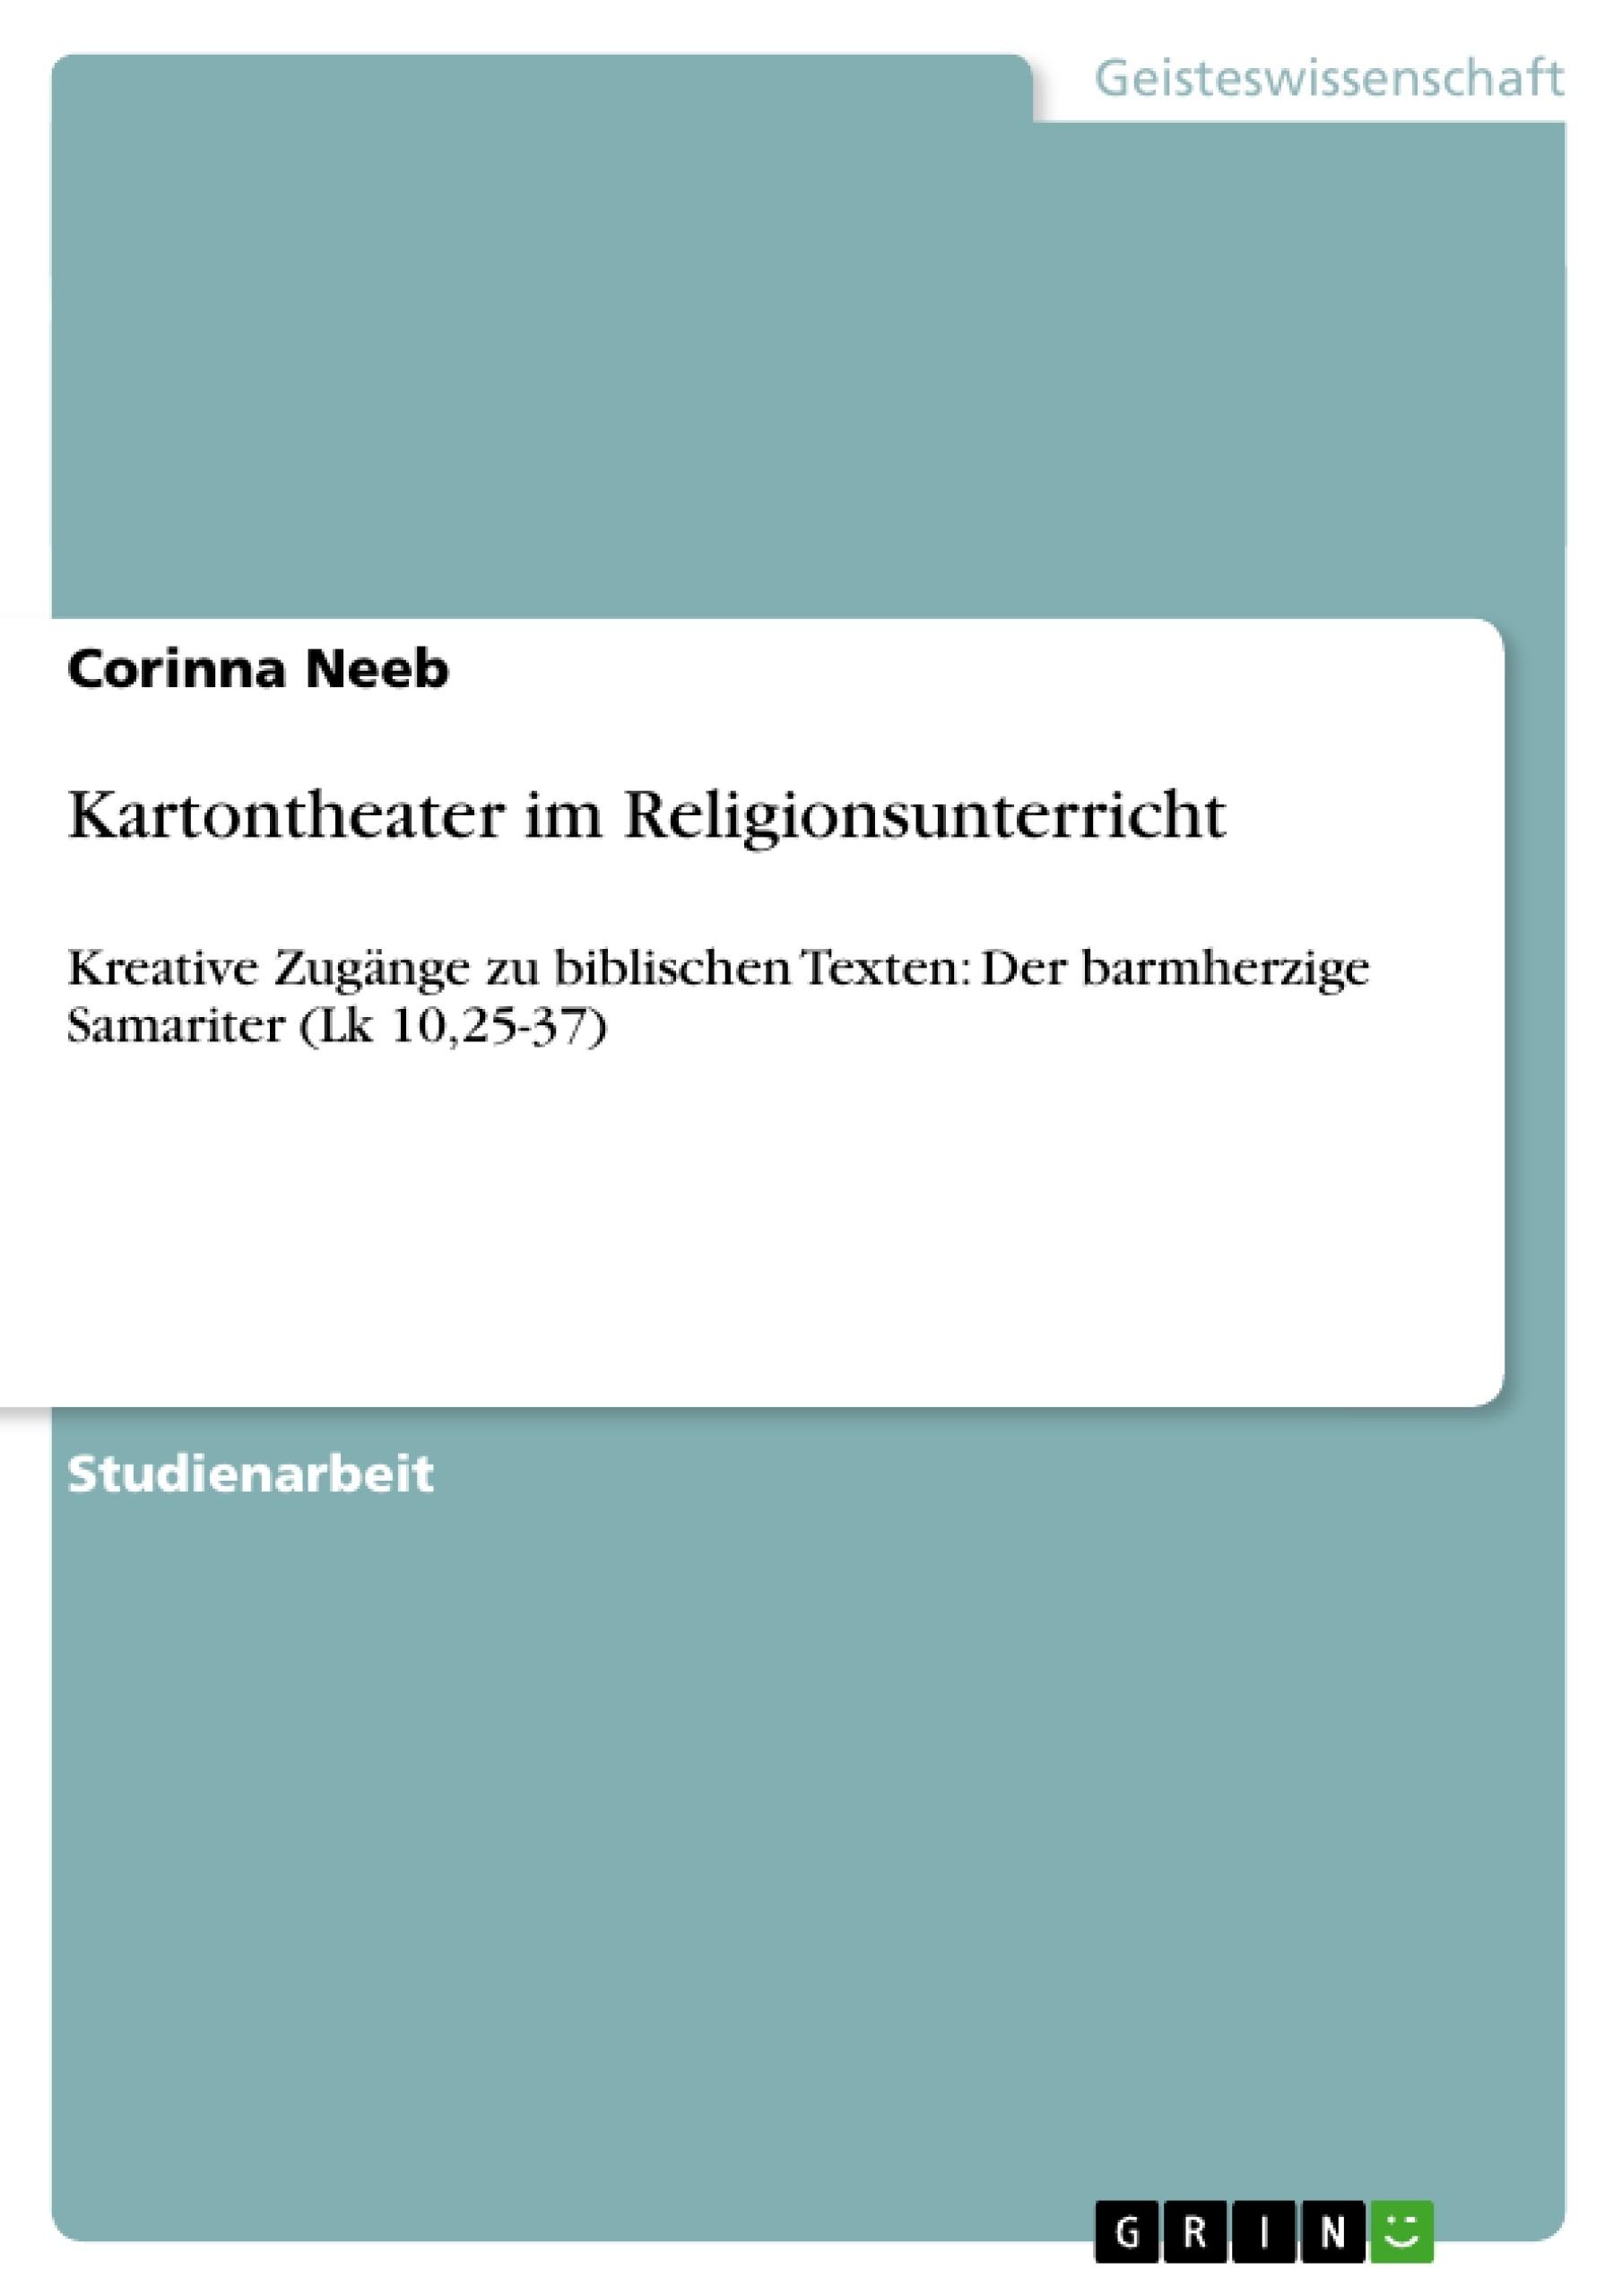 Titel: Kartontheater im Religionsunterricht